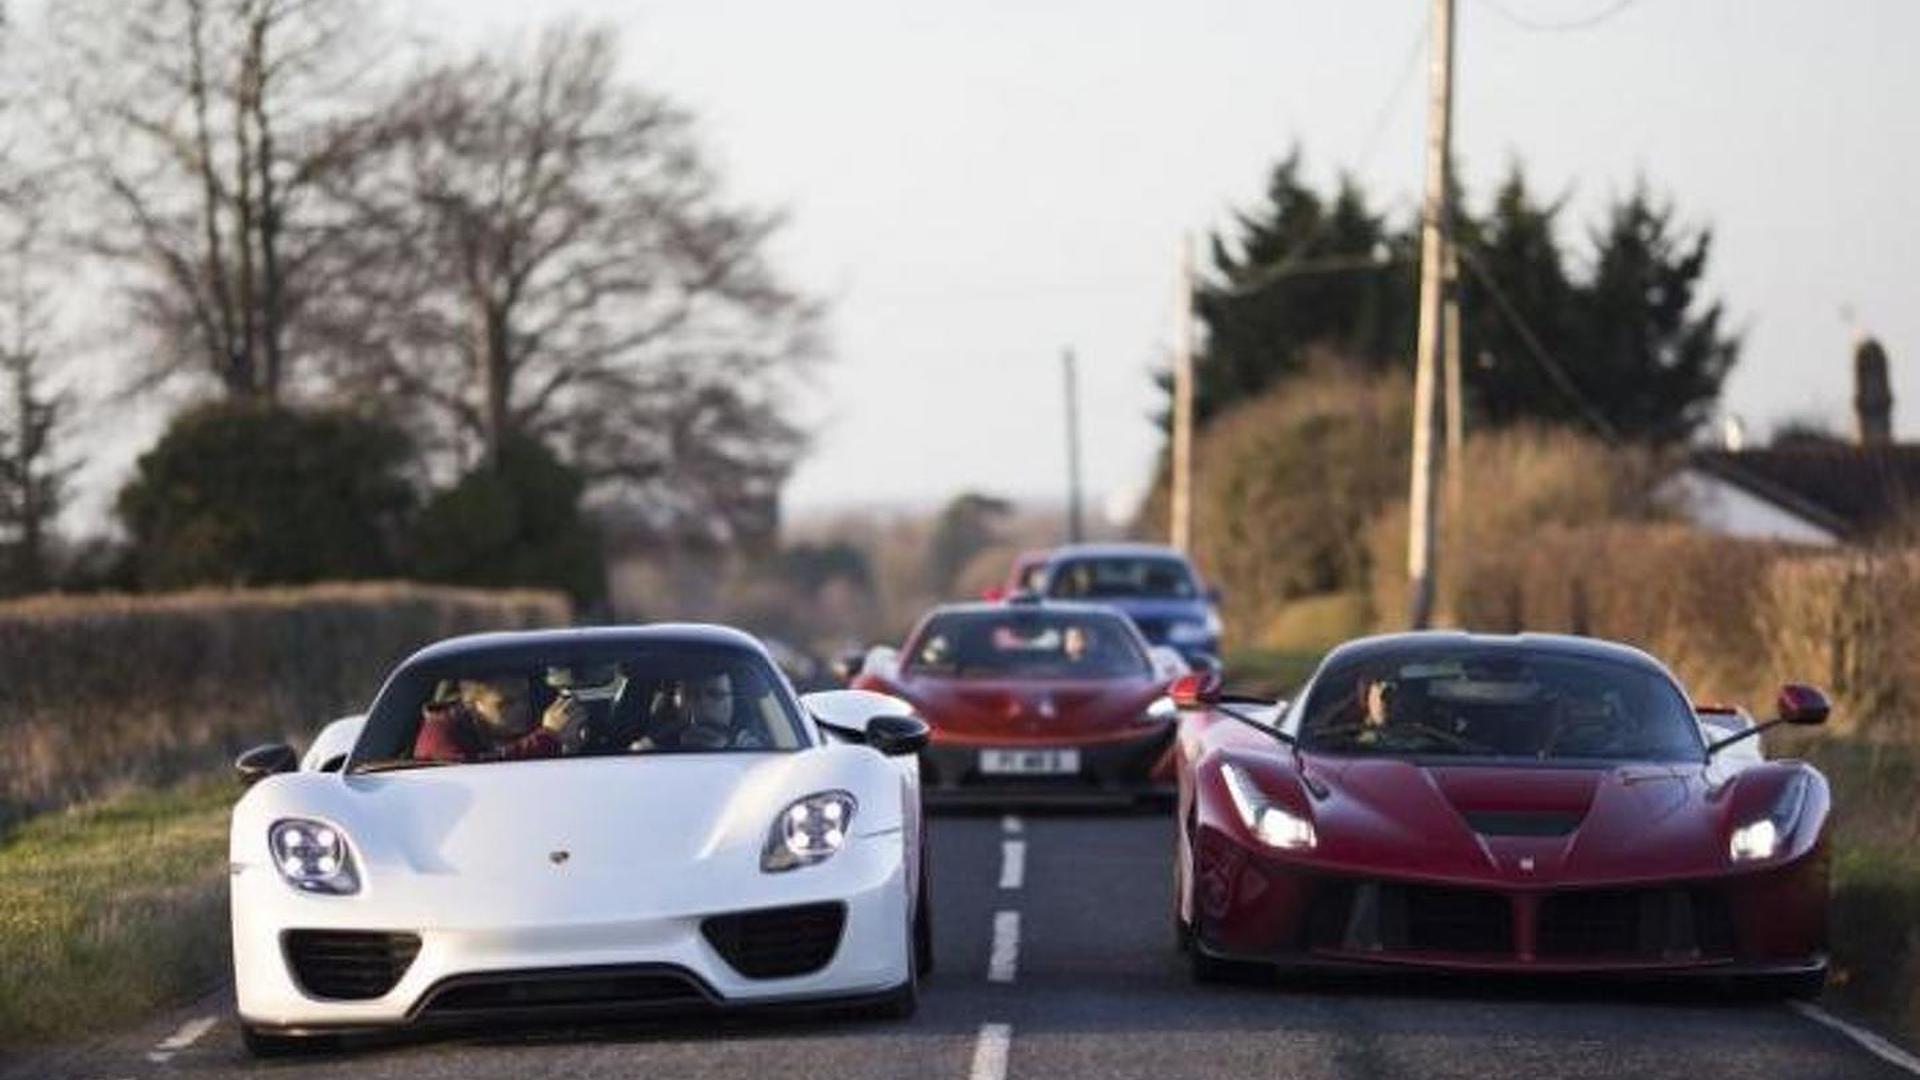 Meet The Man Who Owns The Hottest Supercar Trio Laferrari Mclaren P1 And Porsche 918 Spyder